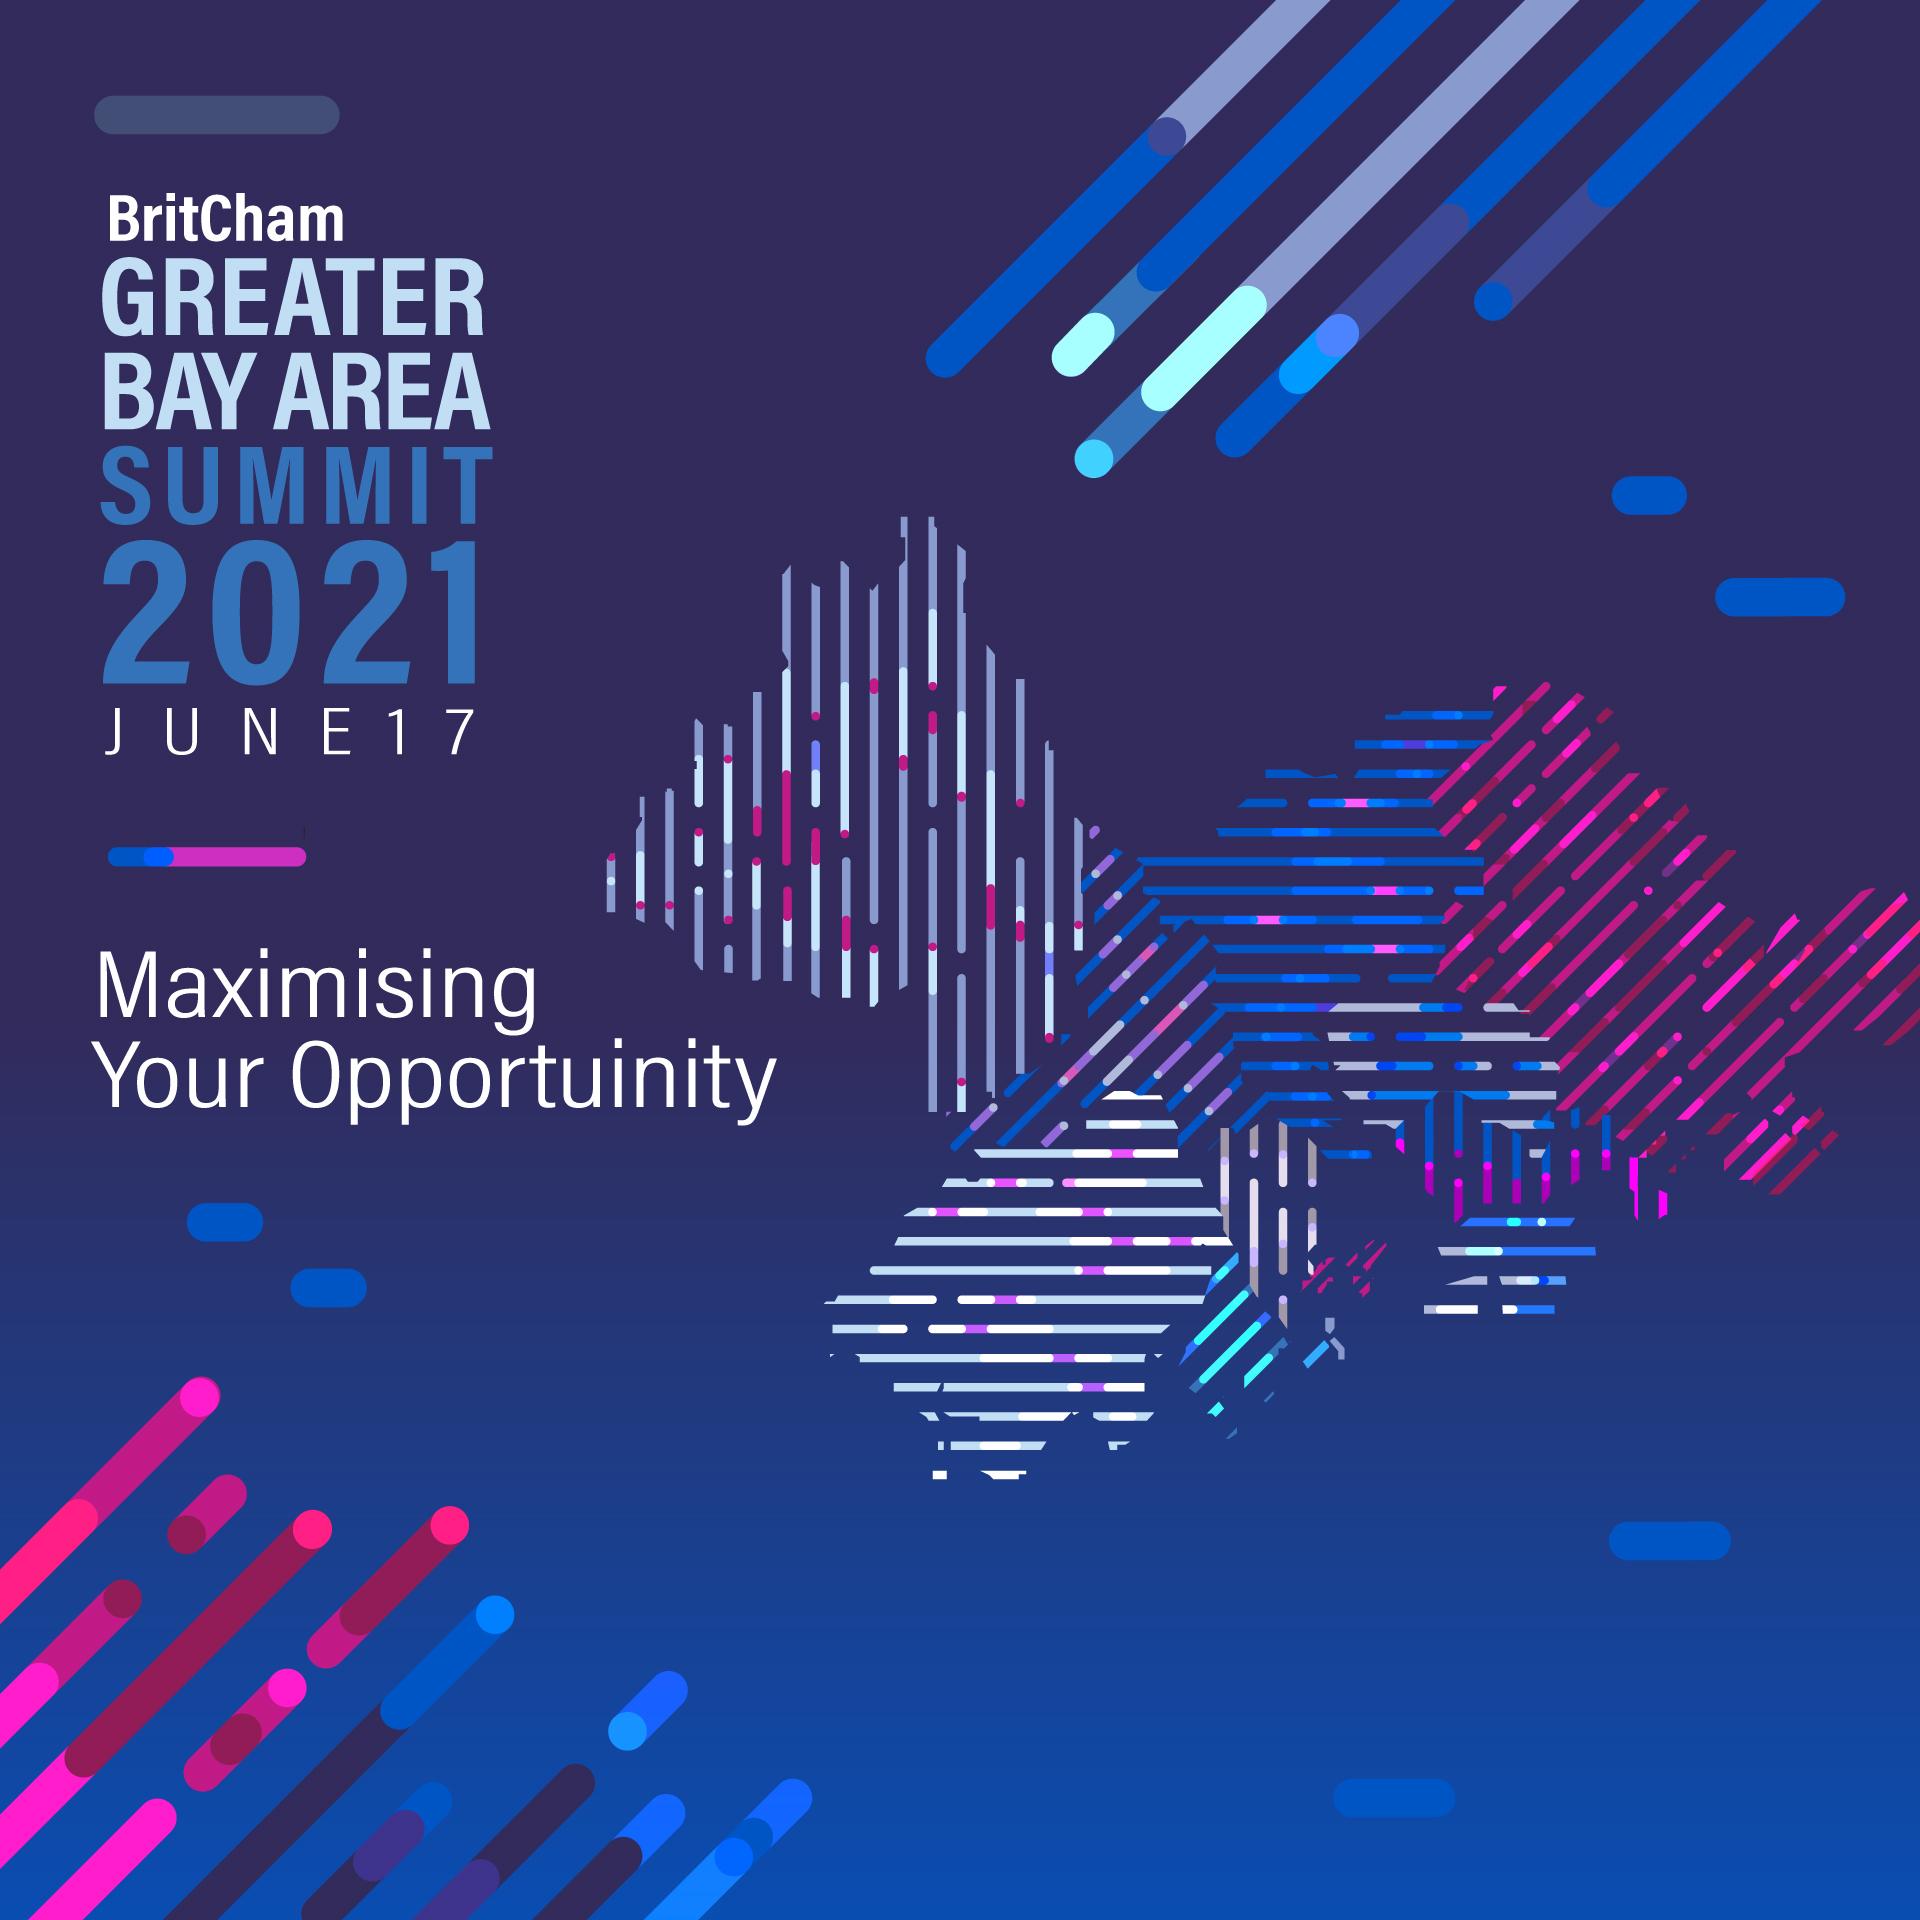 BritCham HK Greater Bay Area Summit 2021